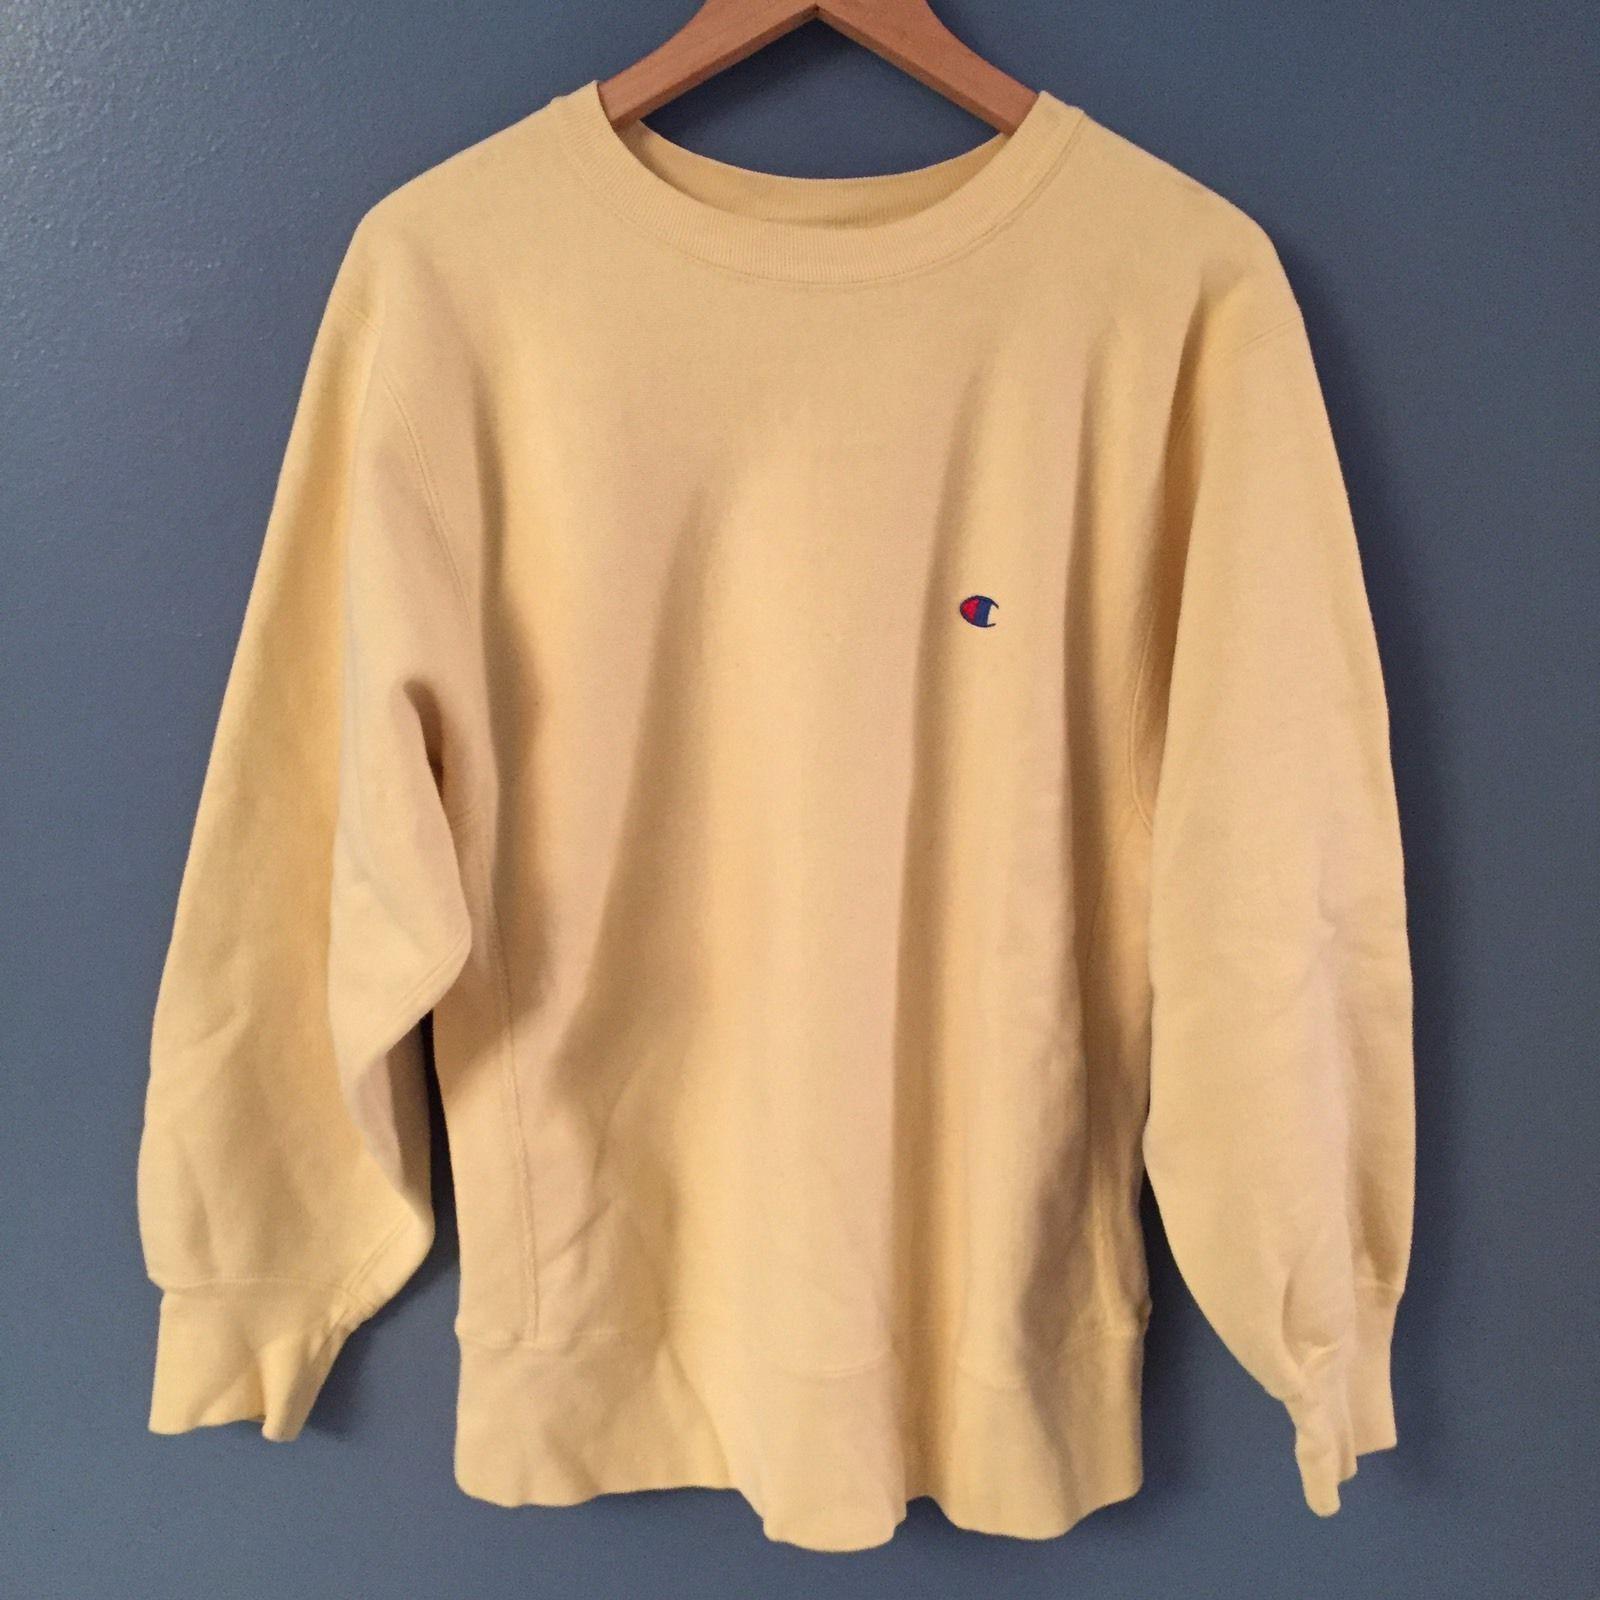 Vintage Rare Light Yellow Cream Champion Reverse Weave Sweatshirt Mens Large 90s Champion Clothing Vintage Sweatshirt Sweatshirts [ 1600 x 1600 Pixel ]